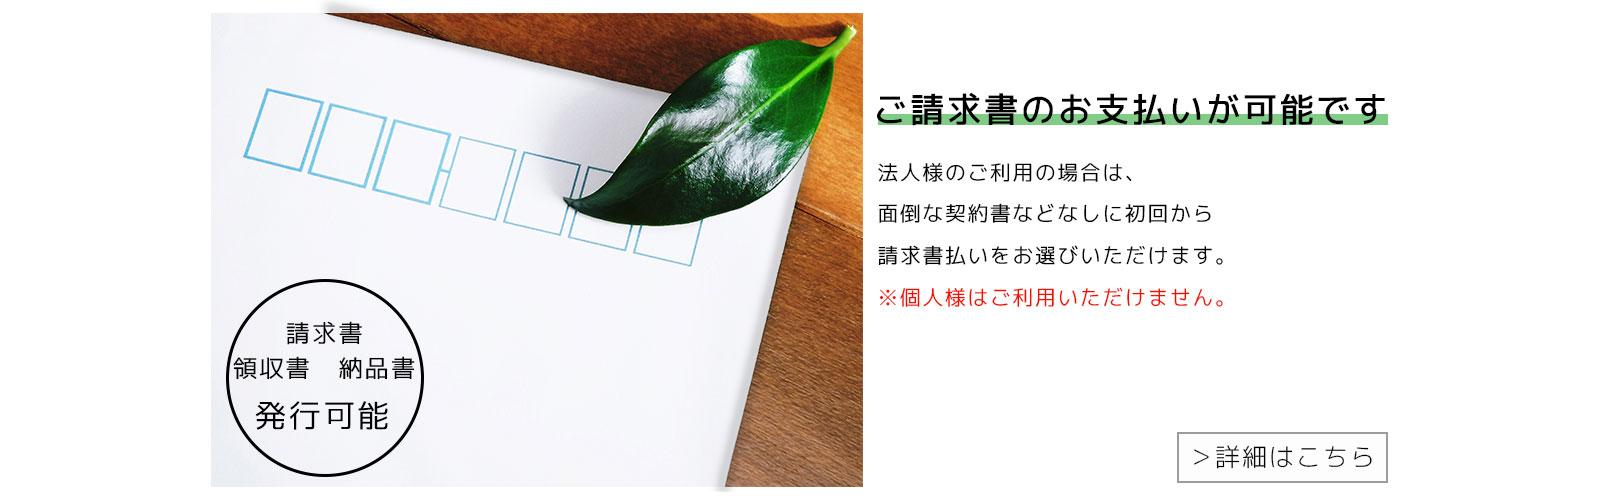 top_03_00.jpg